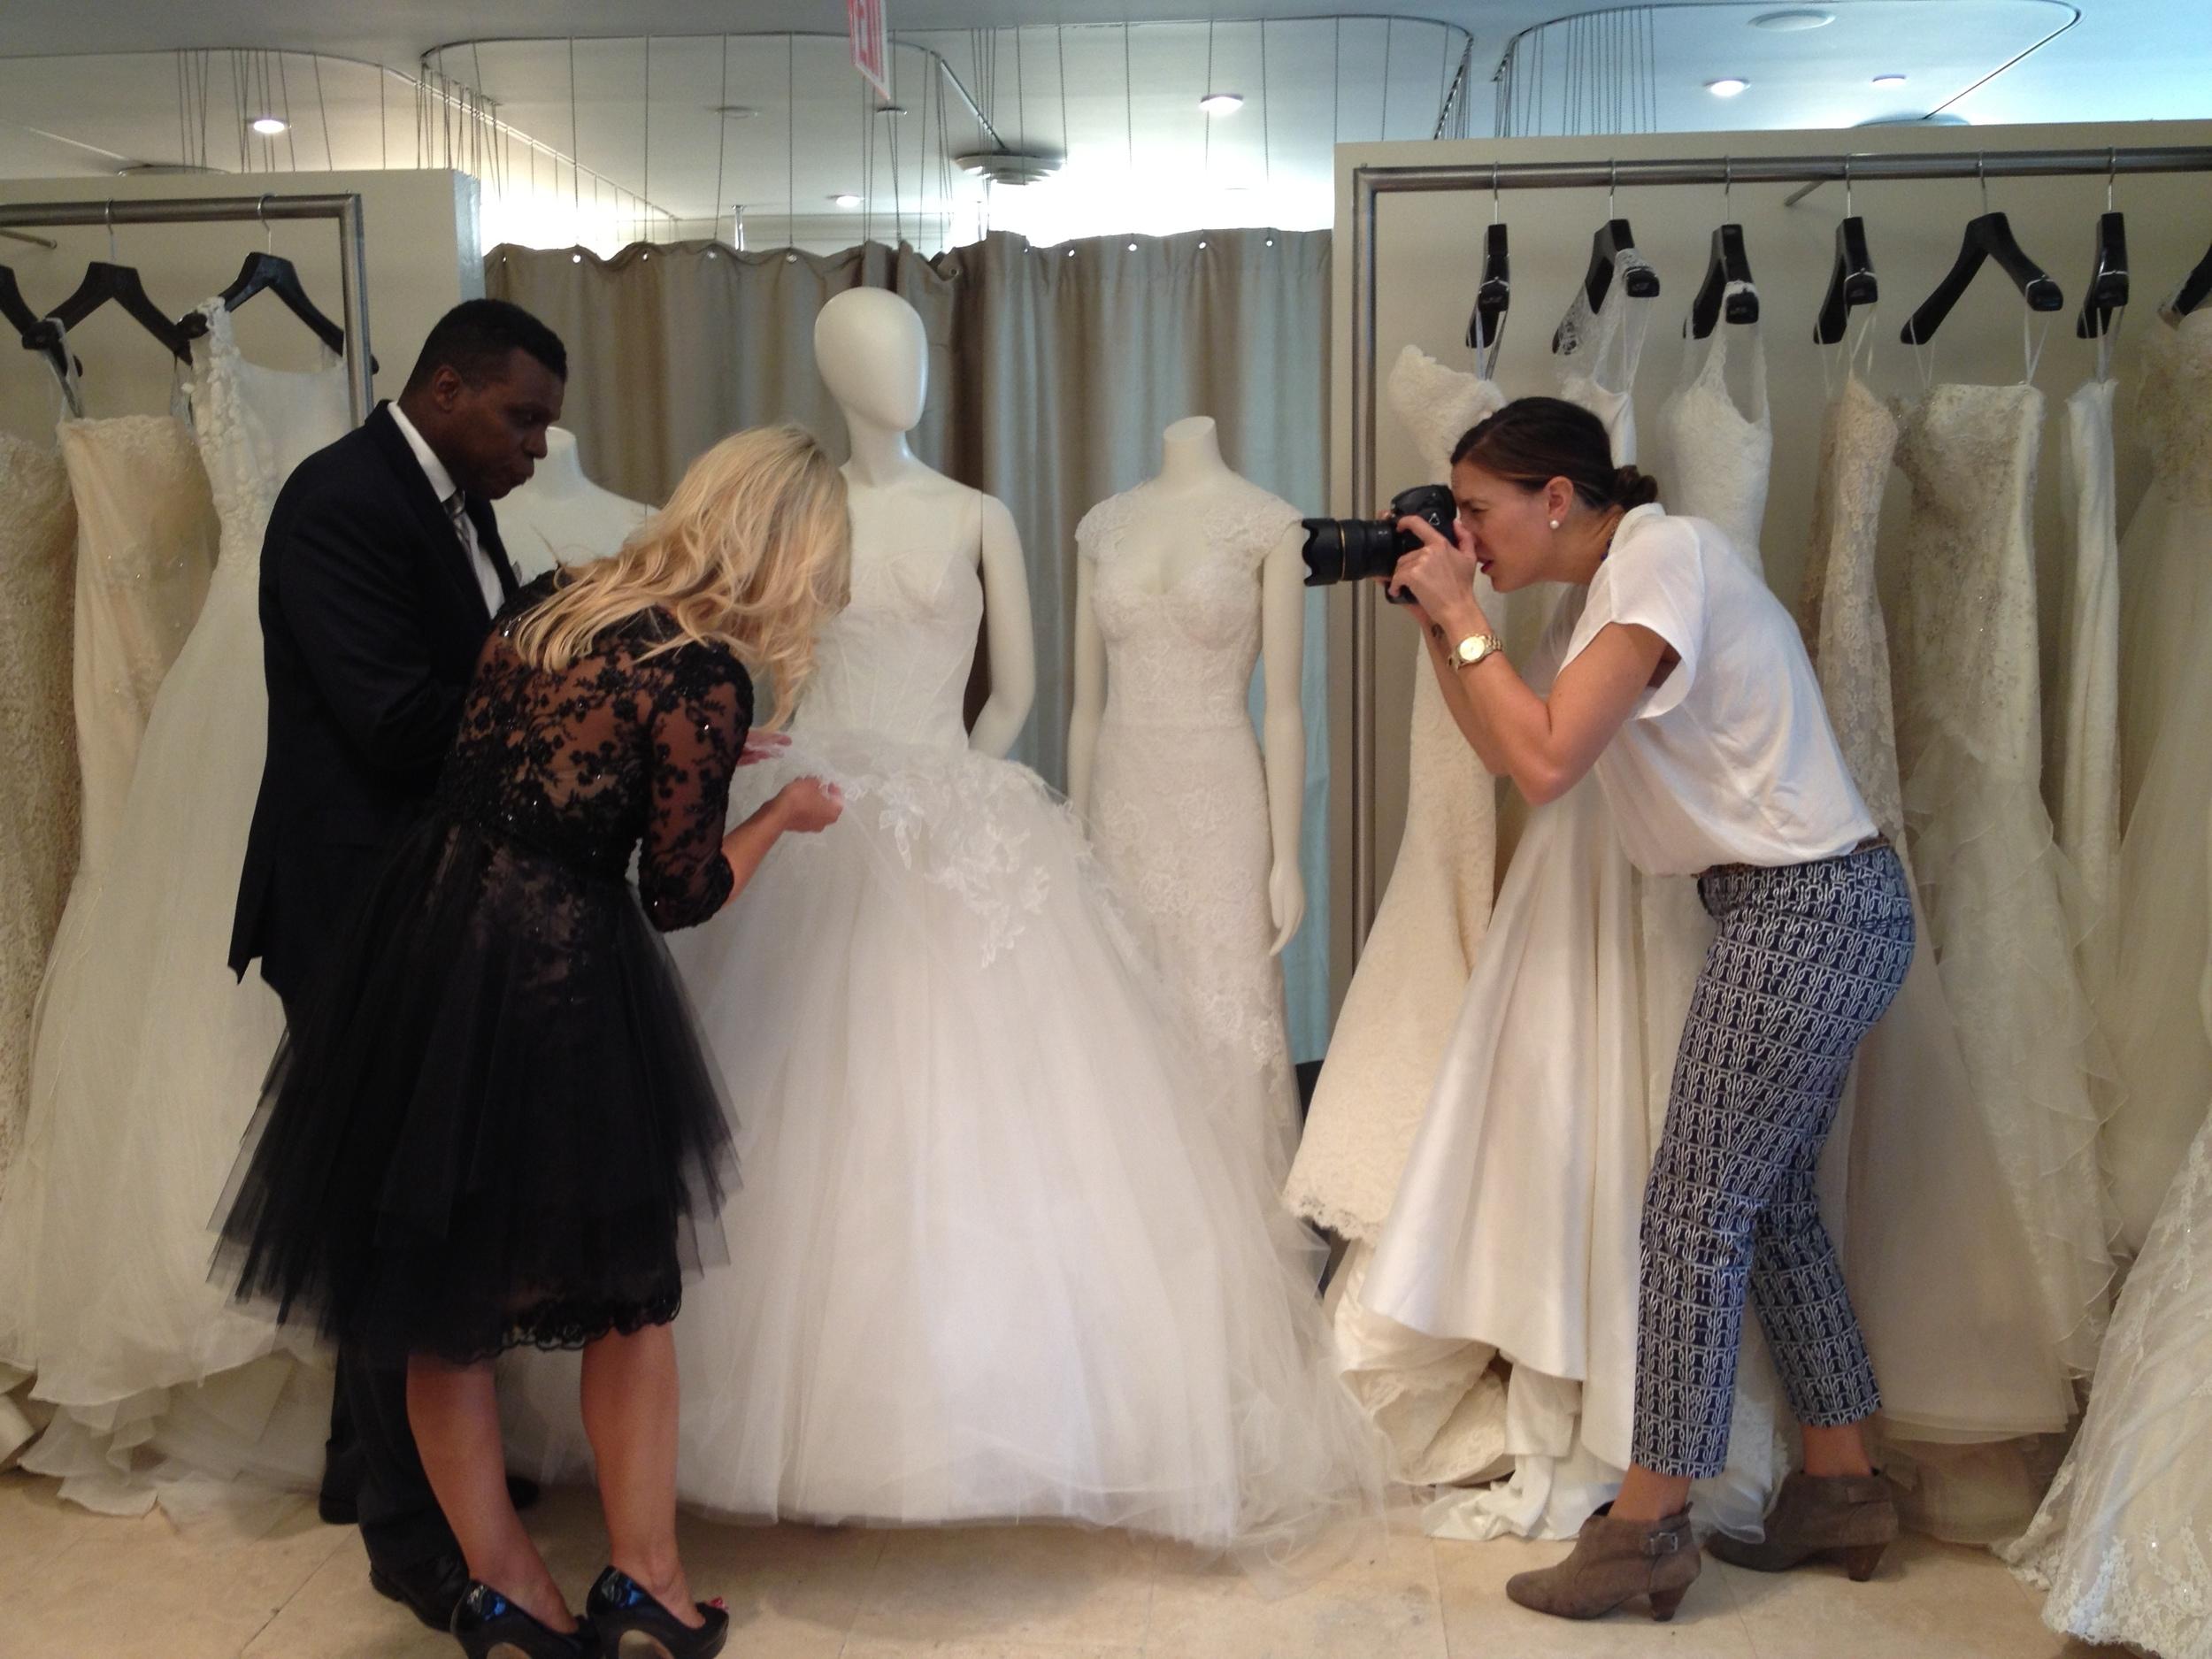 Ceci_New_York_Ceci_Style_Ceci_Johnson_Luxury_Lifestyle_Floral_Lace_Wedding_Letterpress_Inspiration_Design_Custom_Couture_Personalized_Invitations_7.jpg